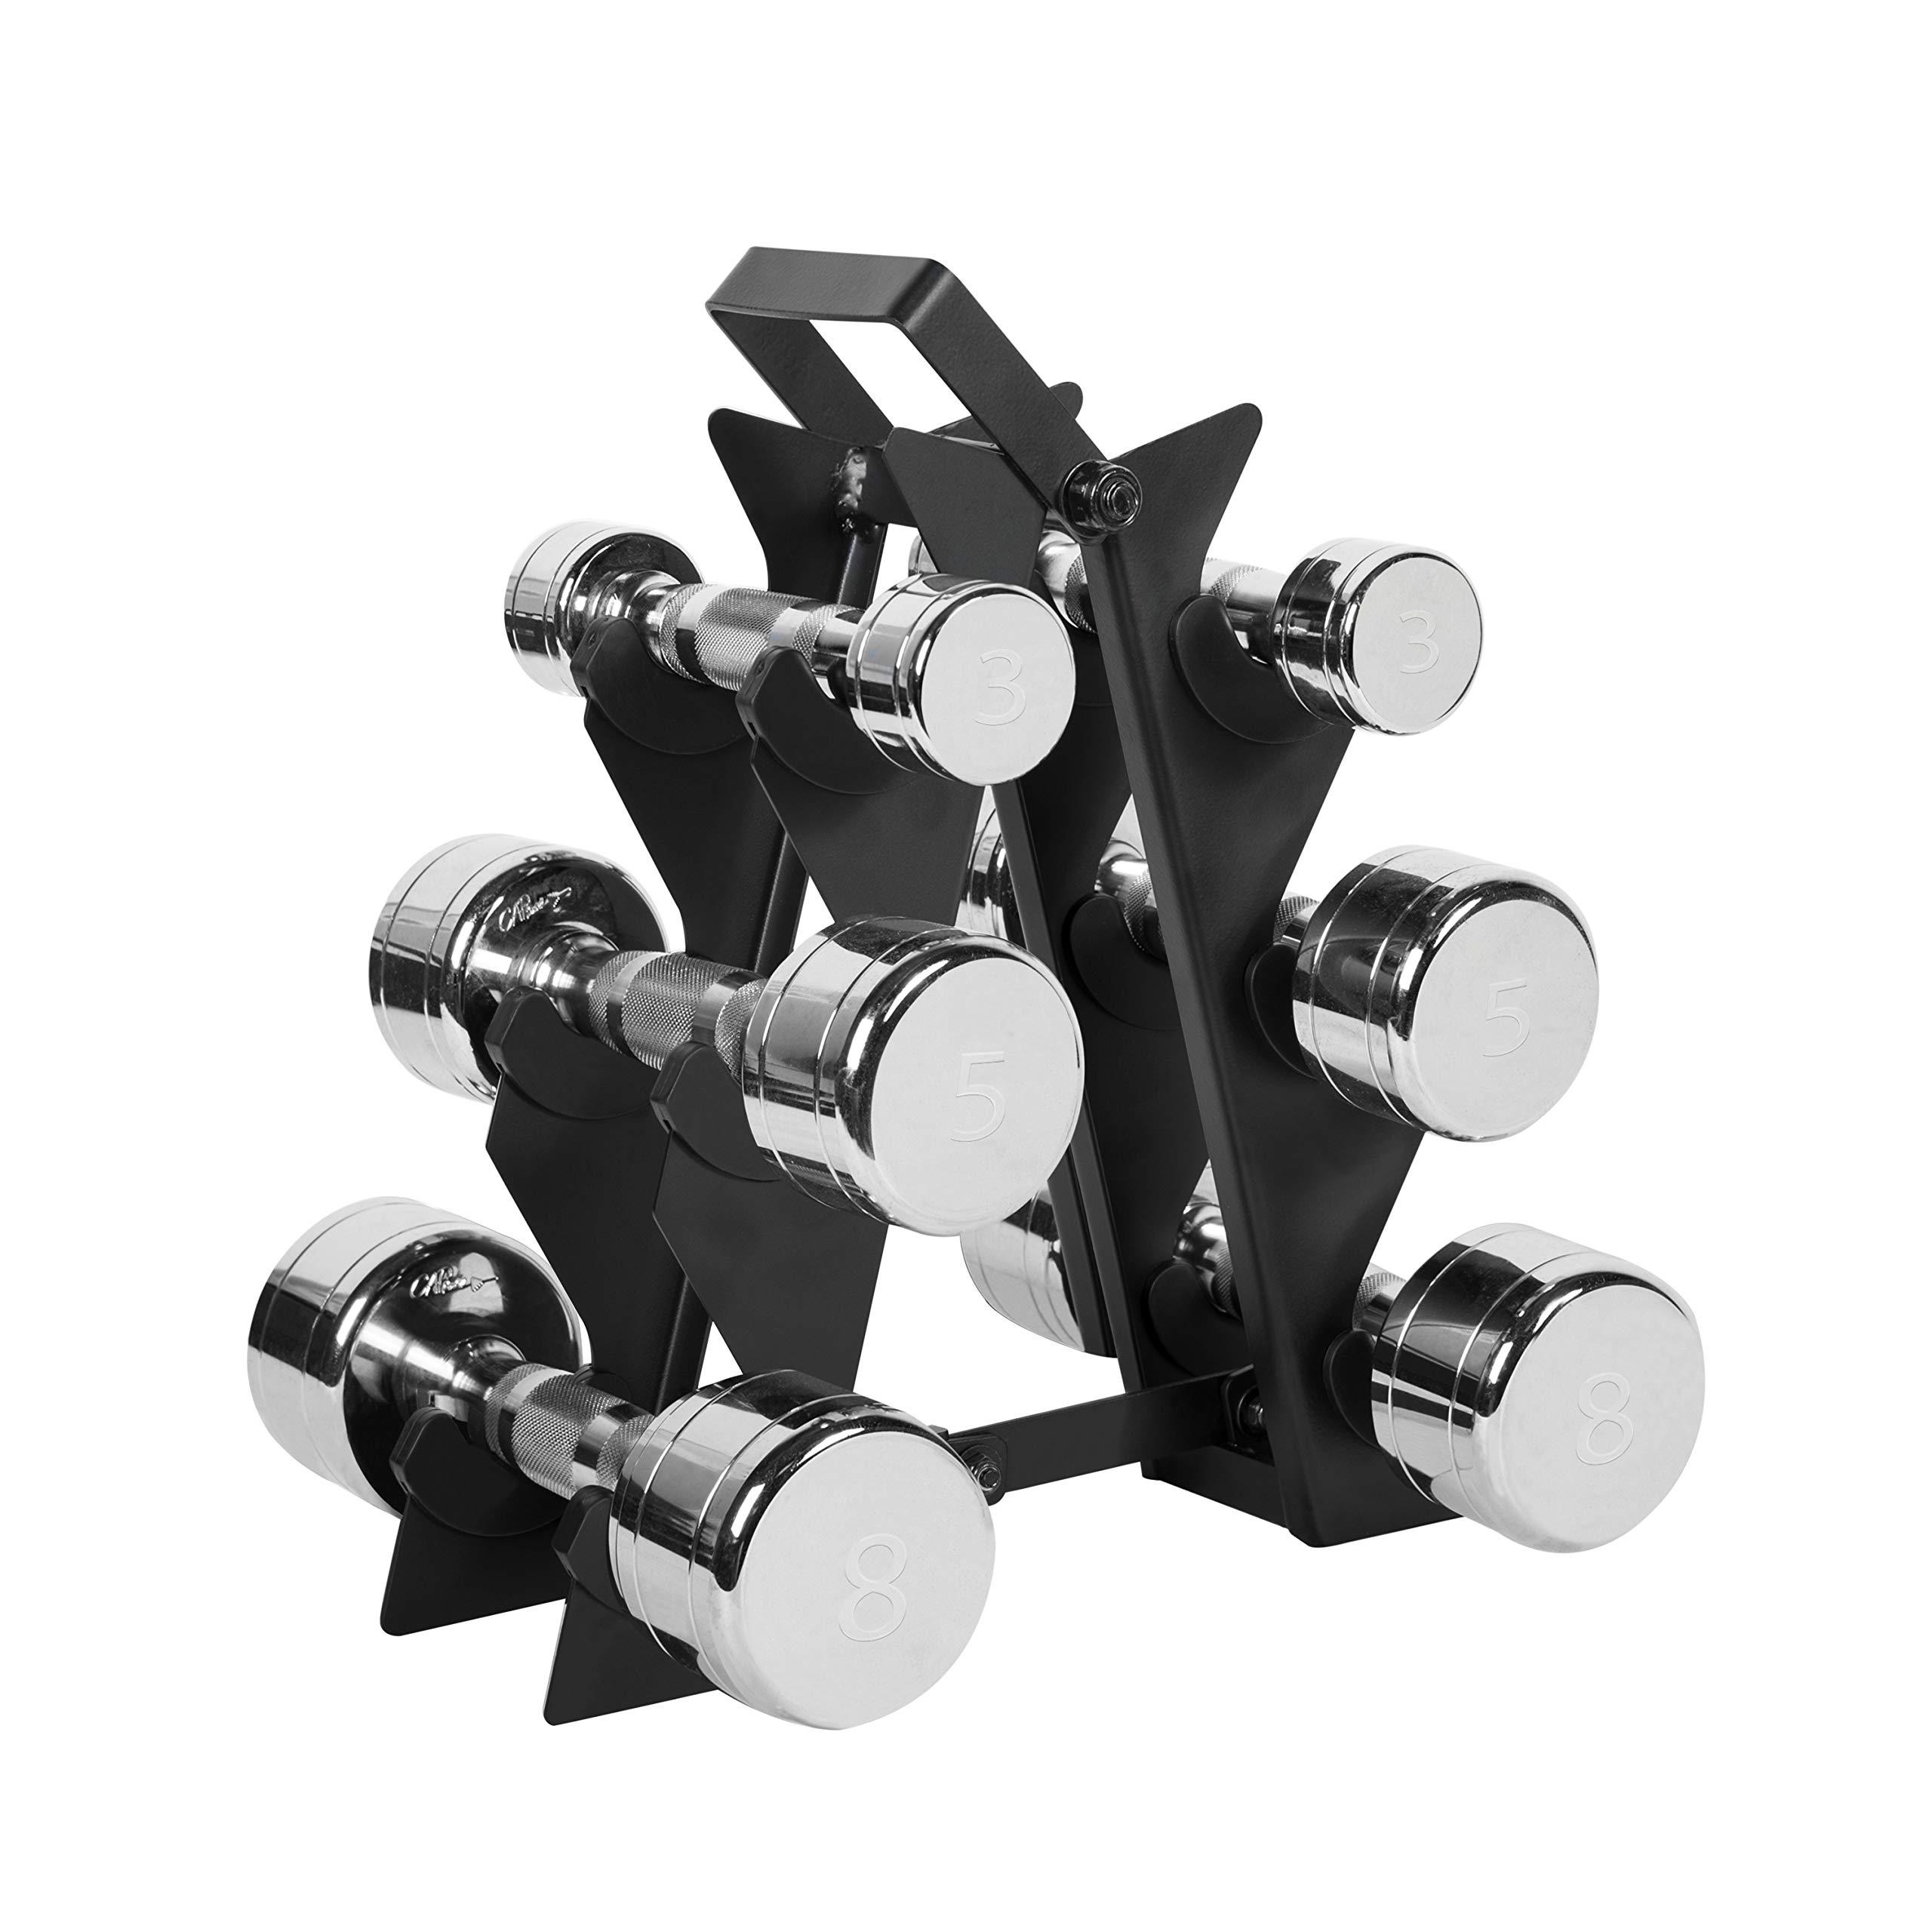 WF Athletic Supply Dumbbell Set with Storage Rack (32lb Chrome Dumbbell Set)